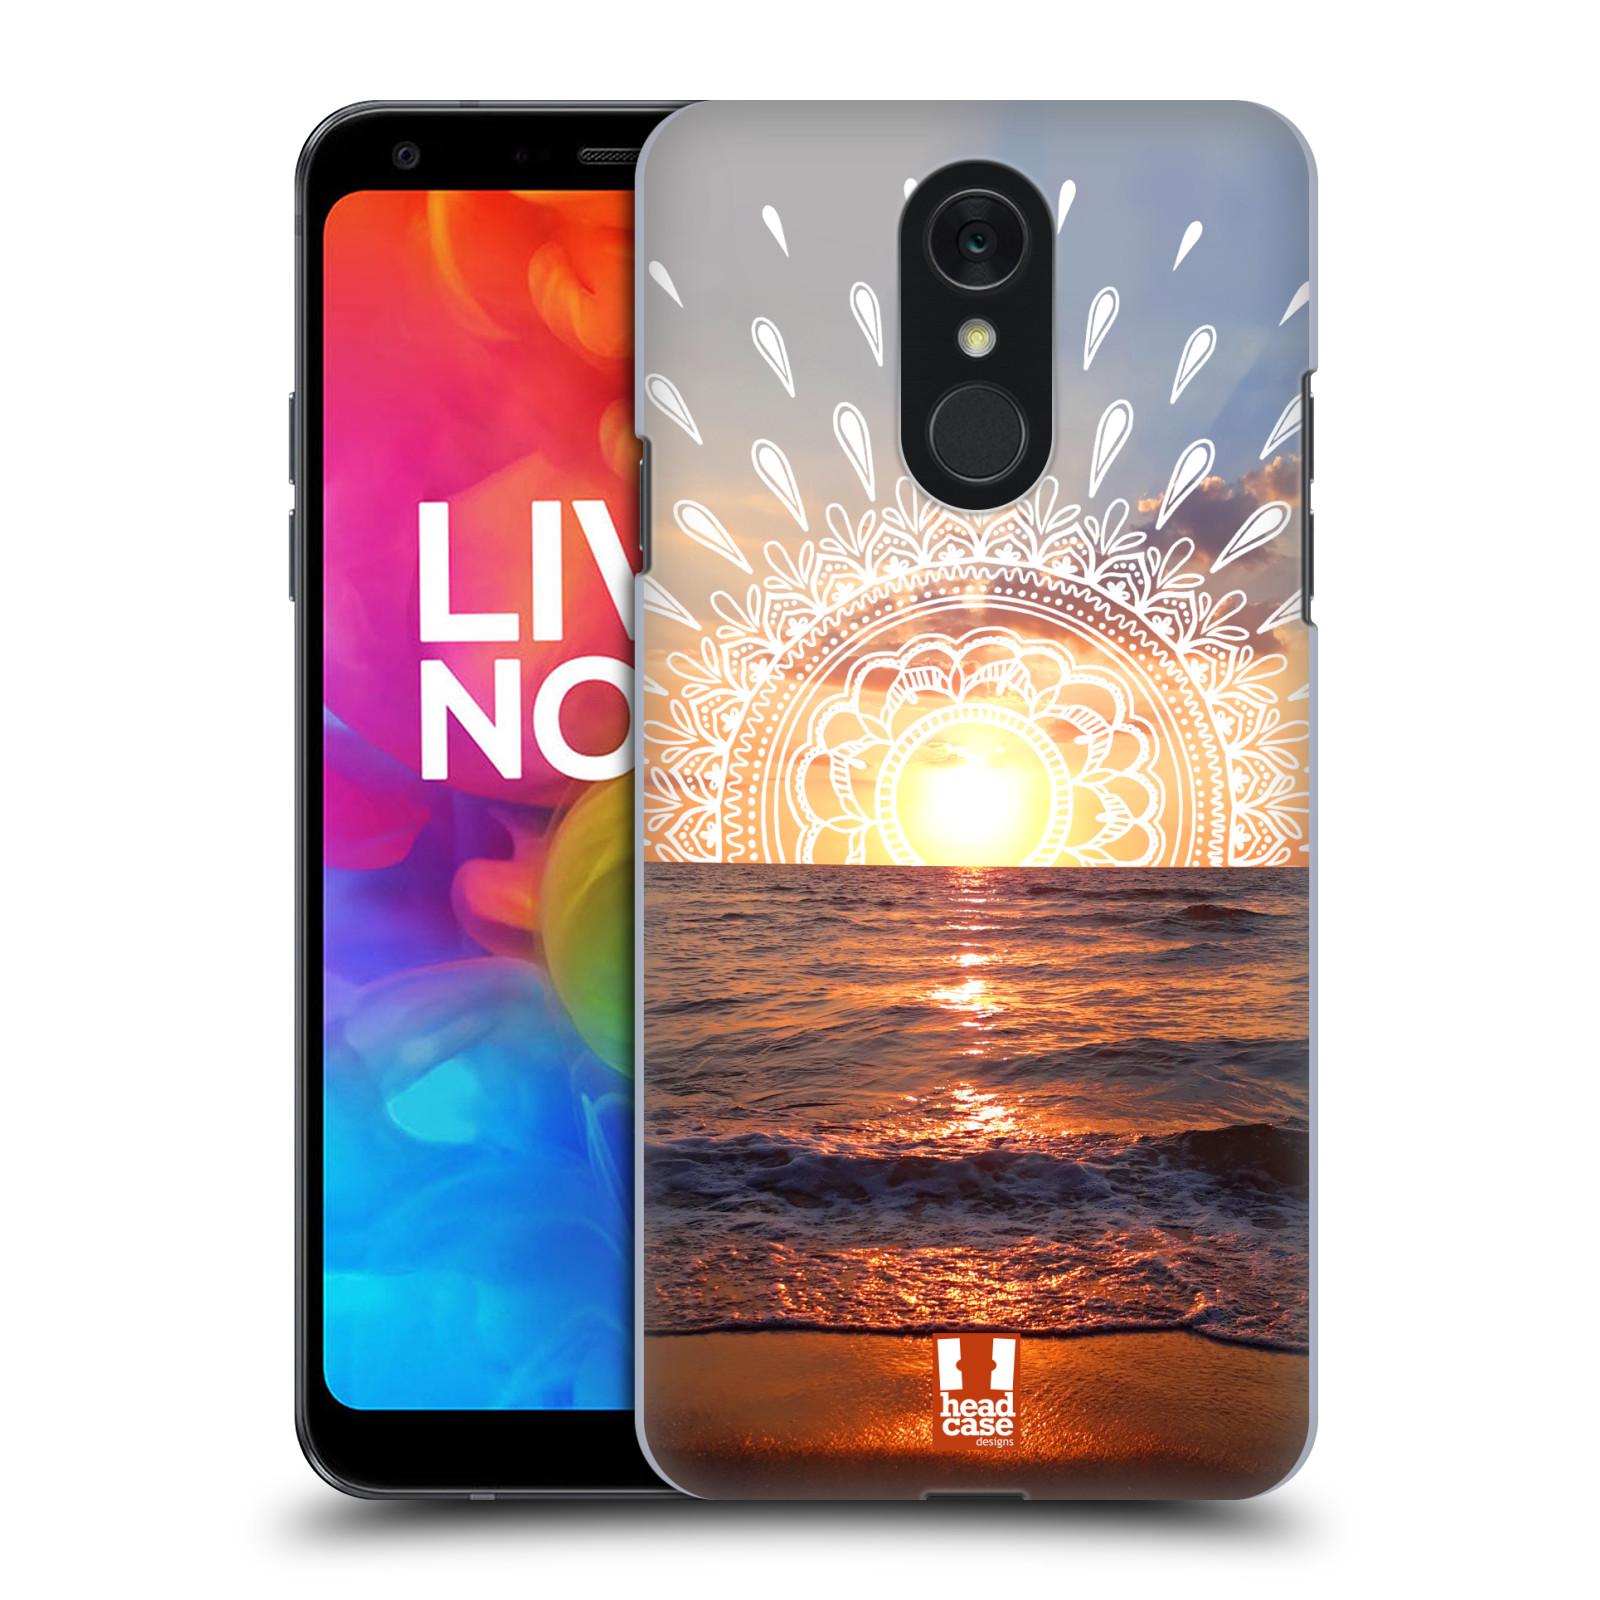 Pouzdro na mobil LG Q7 - HEAD CASE - doodle západ slunce